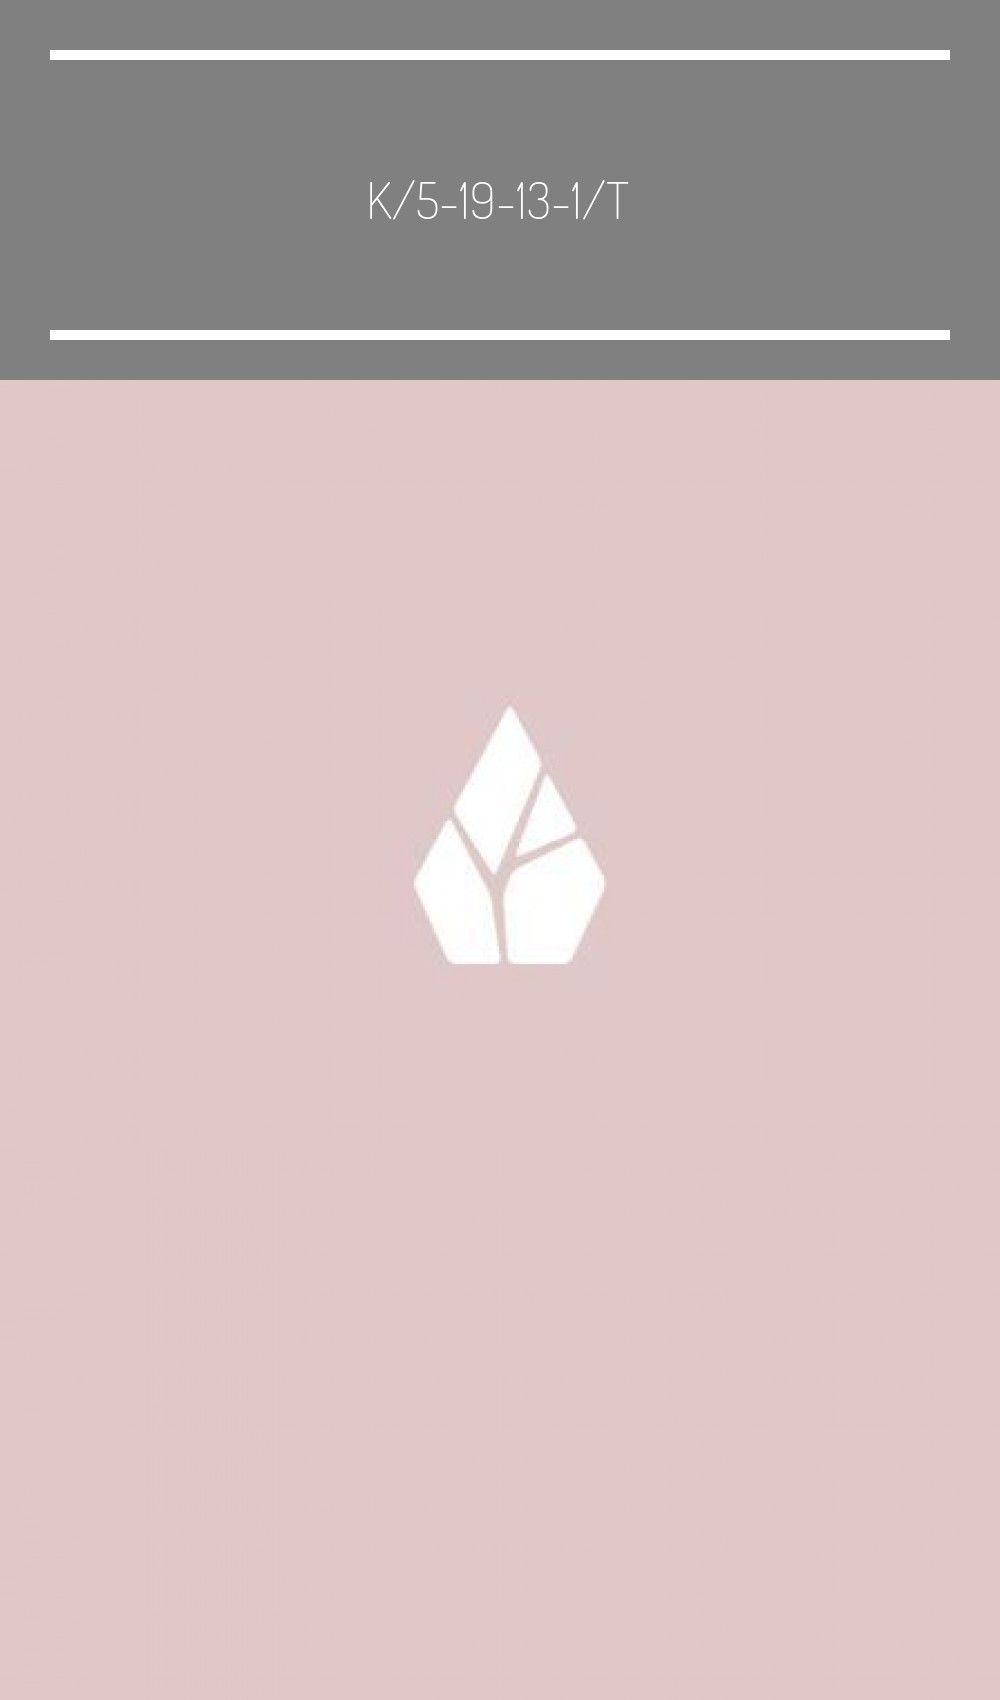 Altrosa Wandfarben Mobellacke In Altrosa Konfigurieren Bequem Online Bestellen Kolorat Rose Pink Wall Color Farben Mischen Altr In 2020 Movie Posters Poster